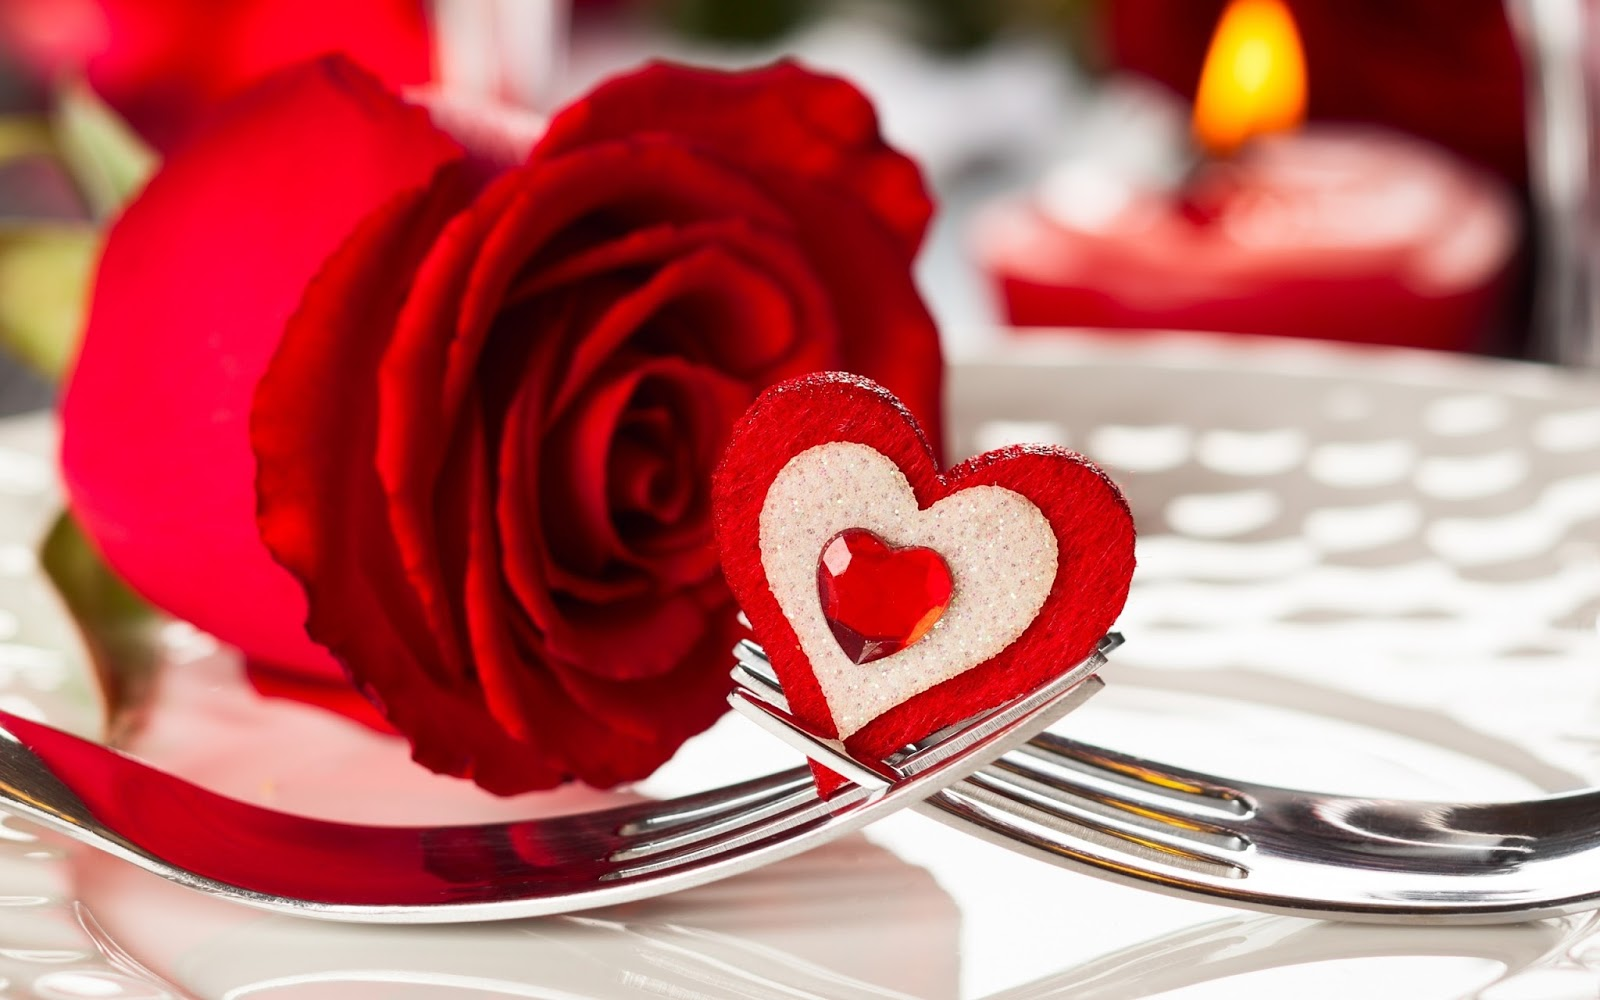 Image of lovers couple & romantic hd desktop wallpaper download.